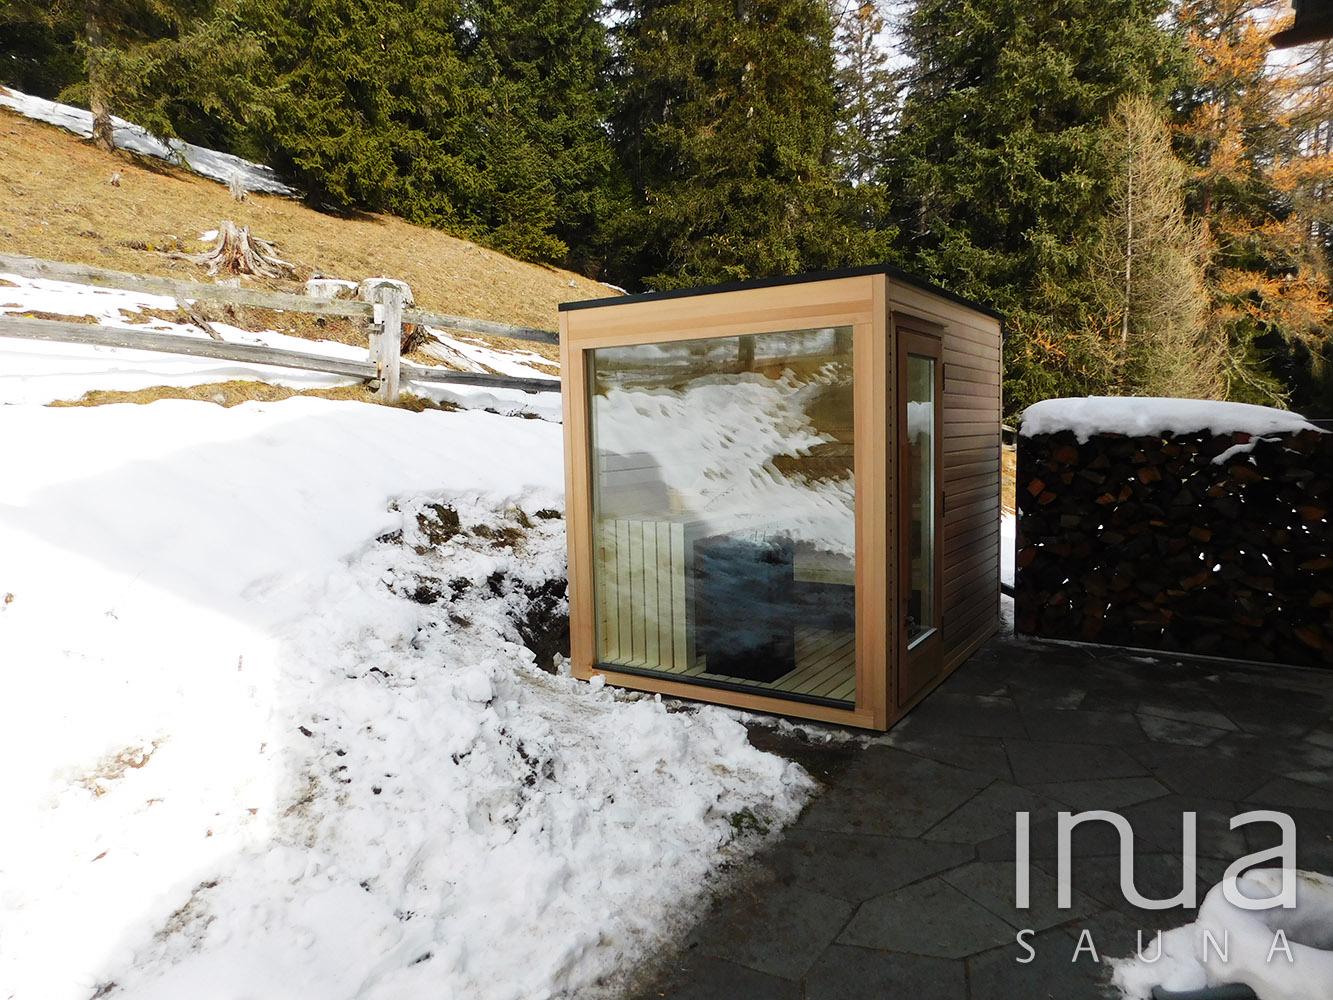 INUA-Udendoers-Finsk-Sauna_S-Chanf_Schweiz